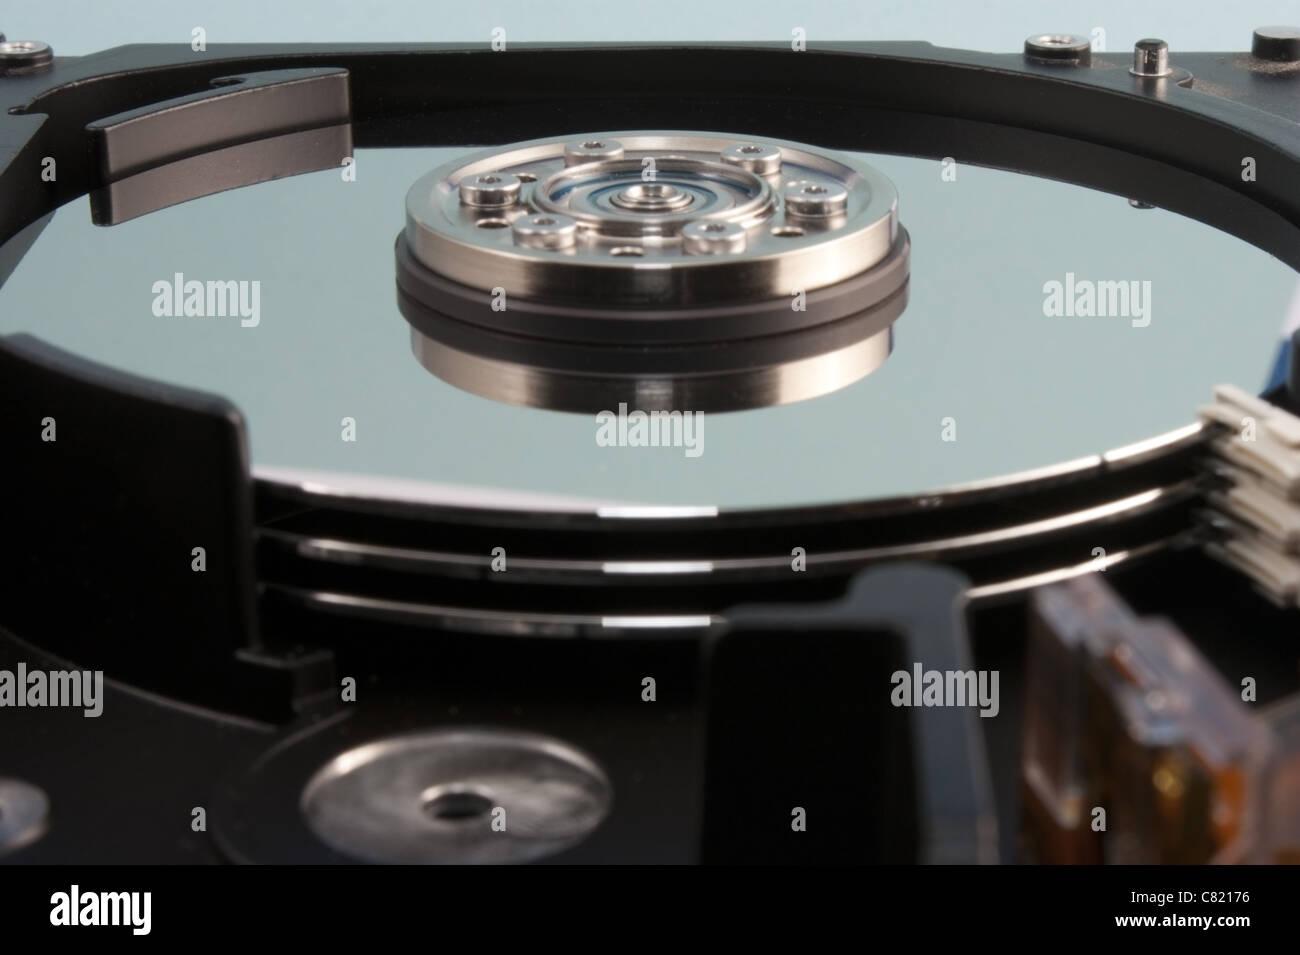 Computer hard drive platters - Stock Image